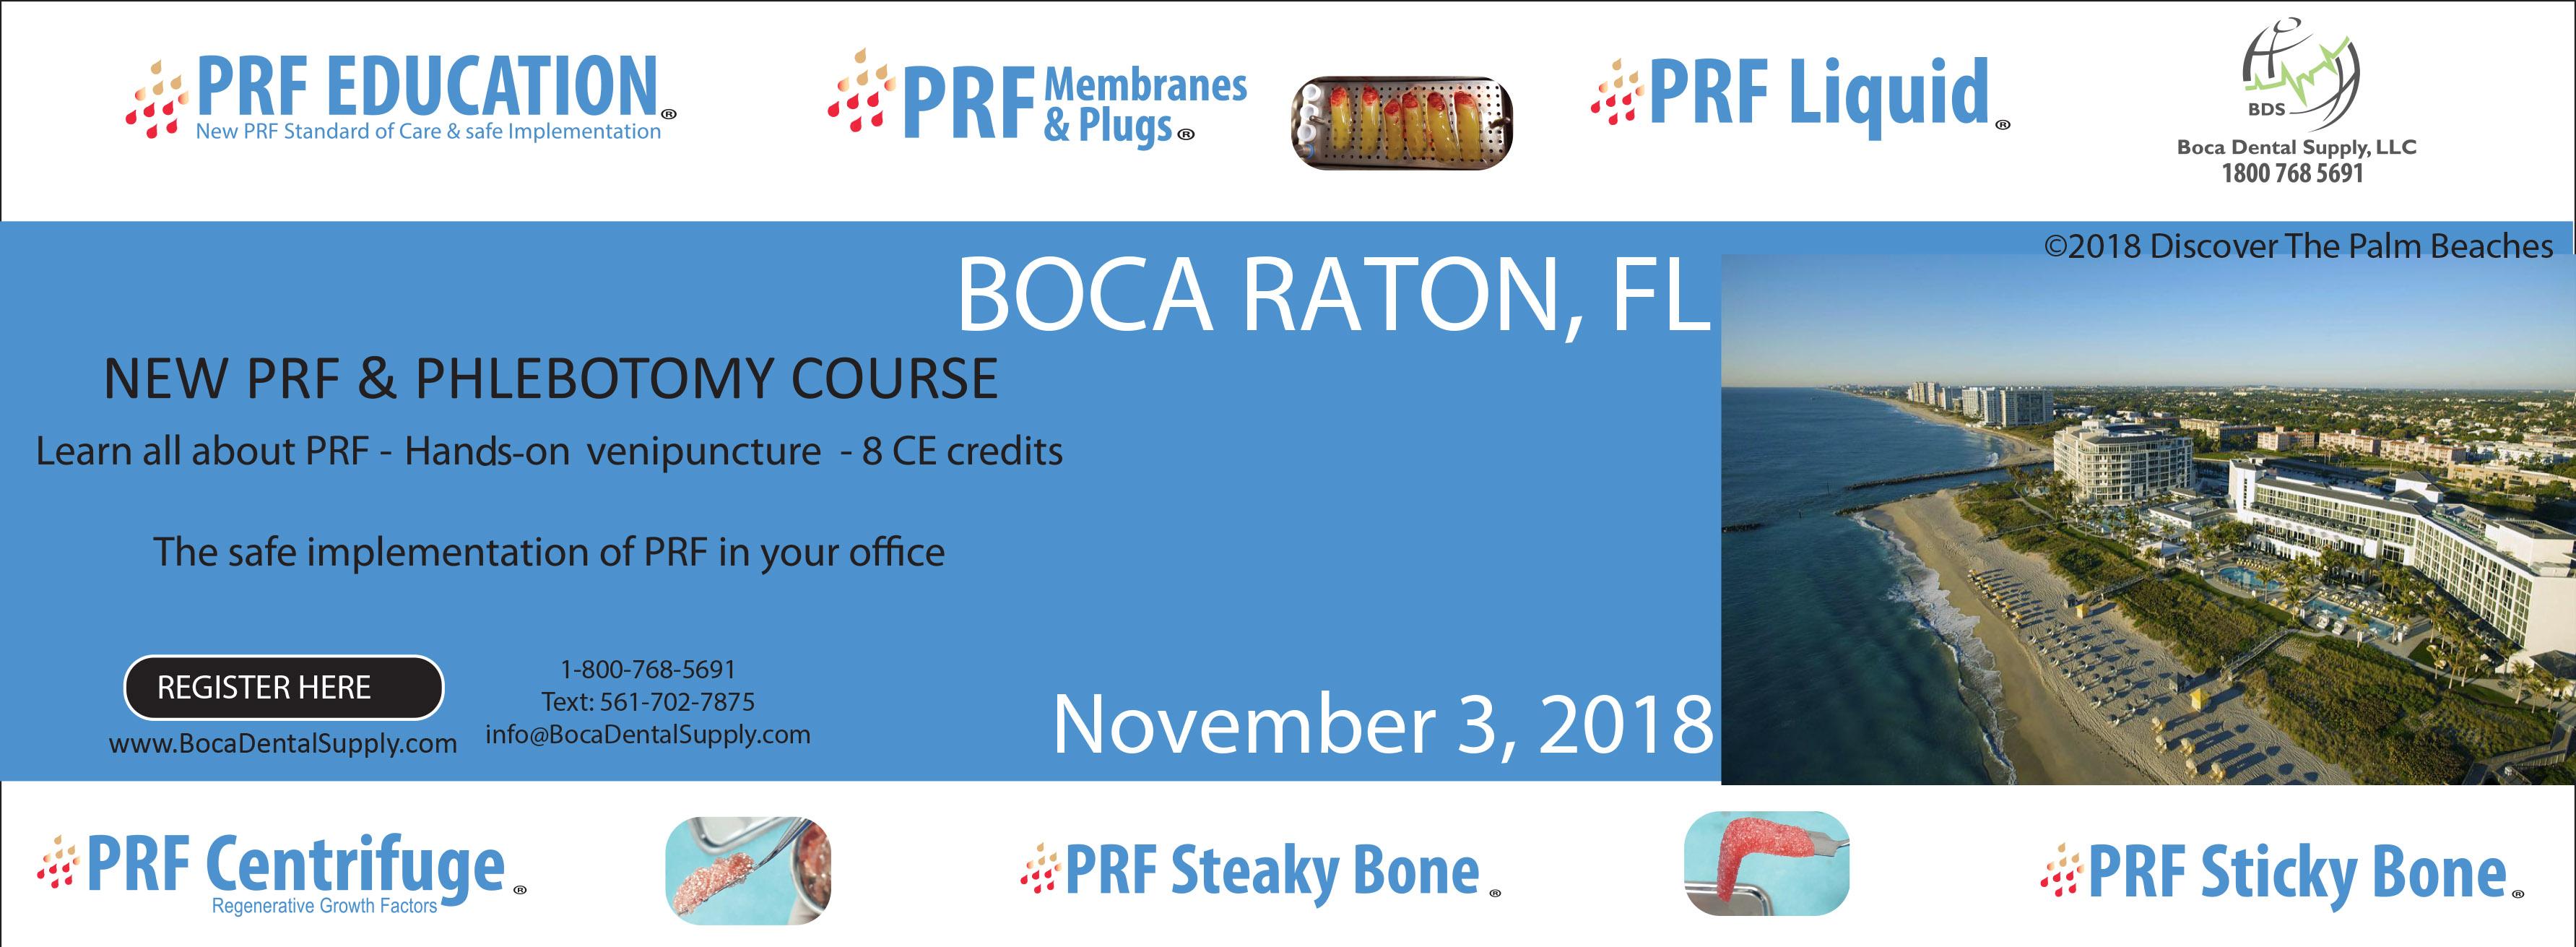 prf-course-boca-november-2018.jpg